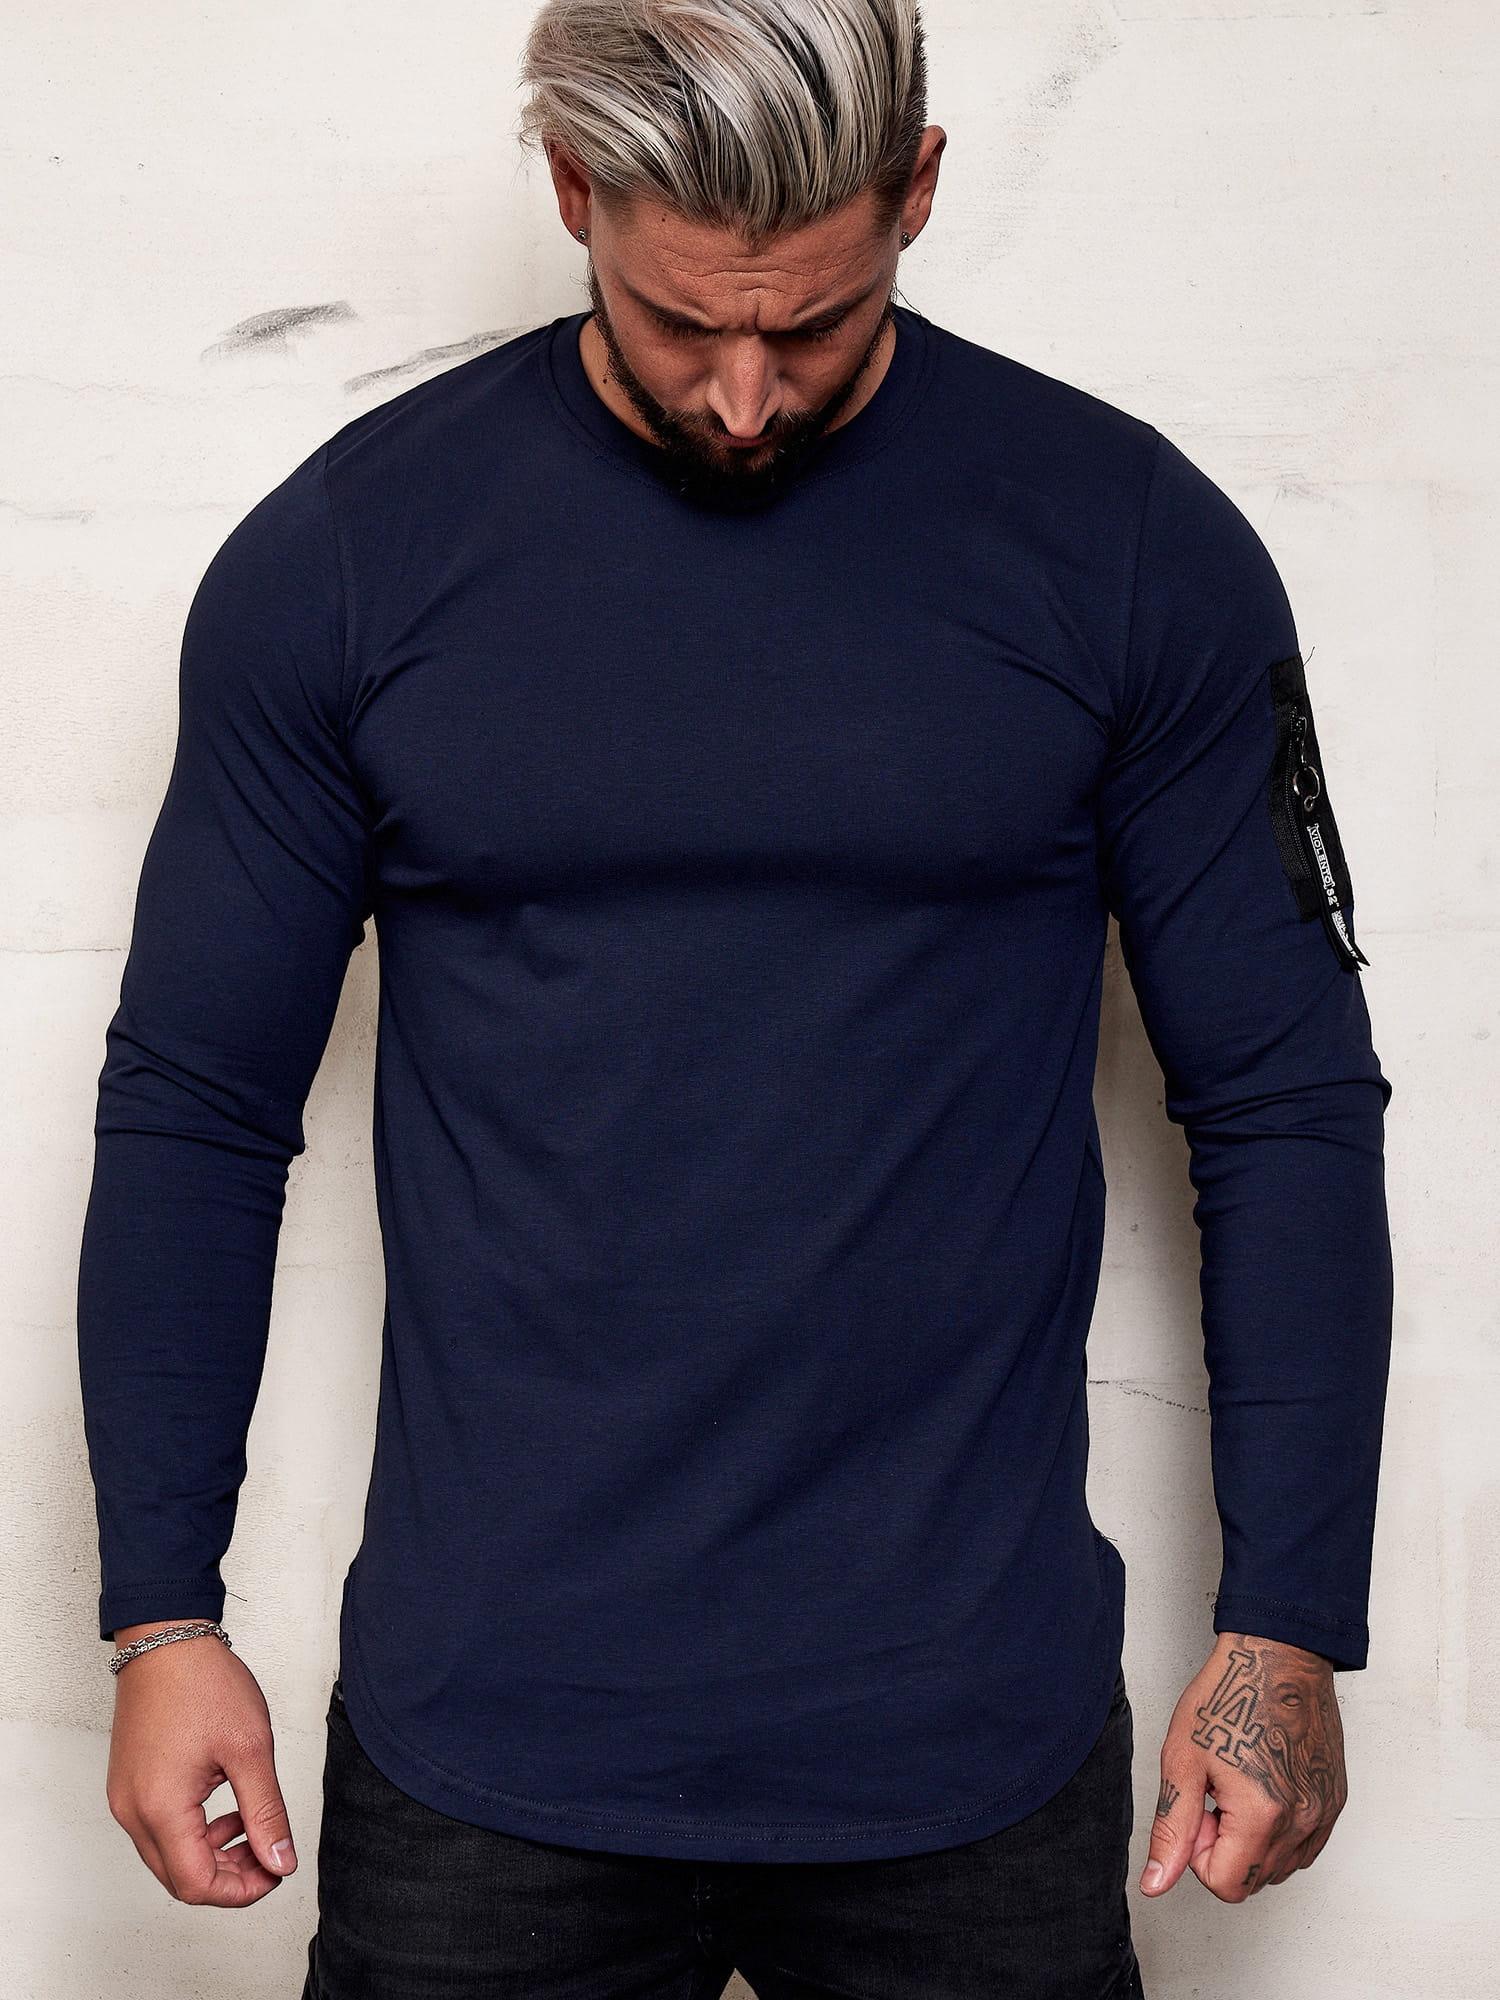 Herren Longsleeve Shirt Langarm Sweatshirt Langarmshirt Modell ...